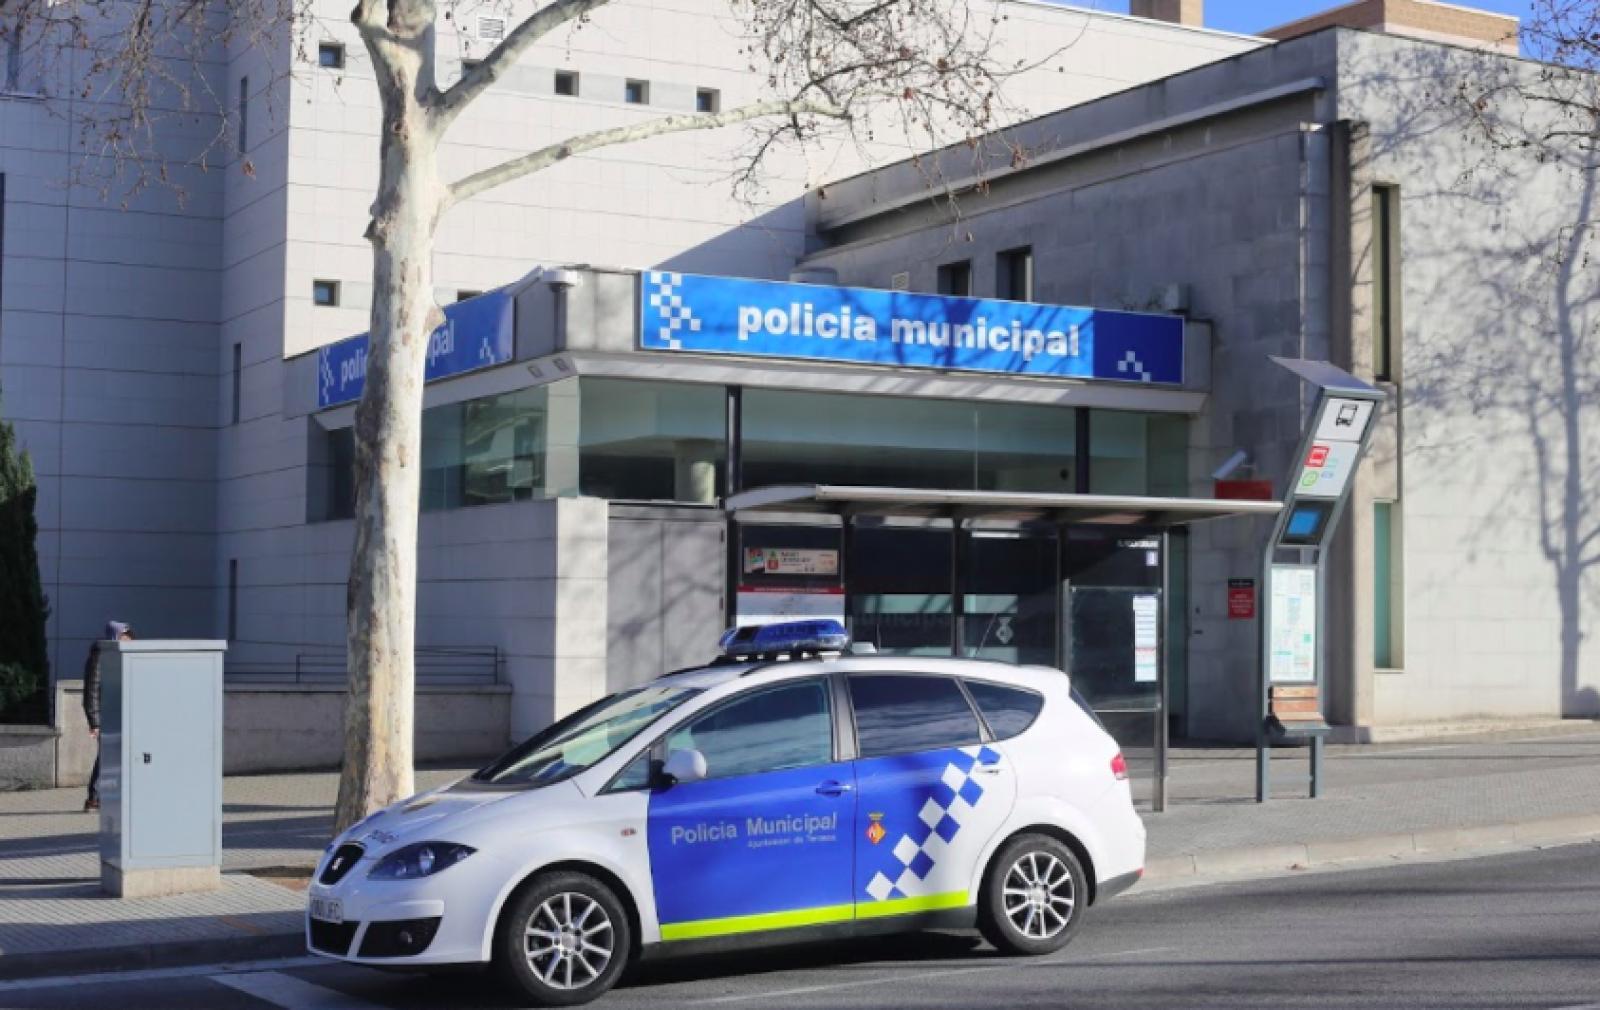 Comissaria de la Policia Municipal de Terrassa